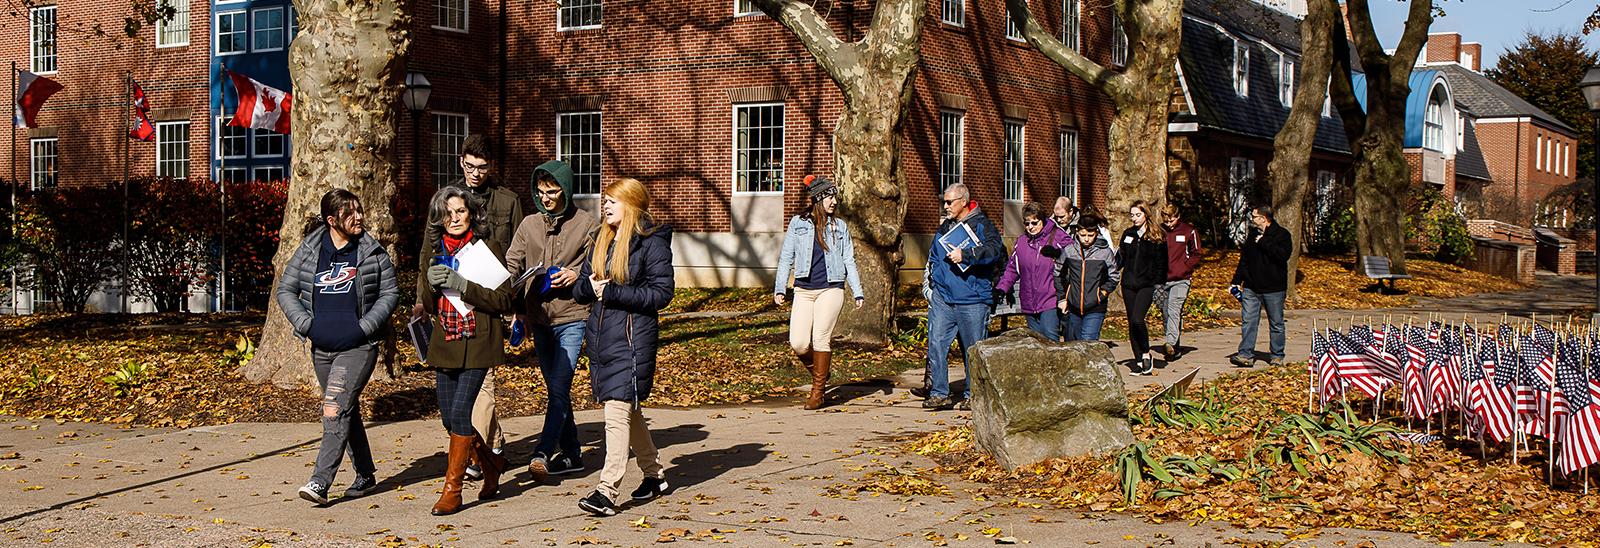 Tours walk across campus